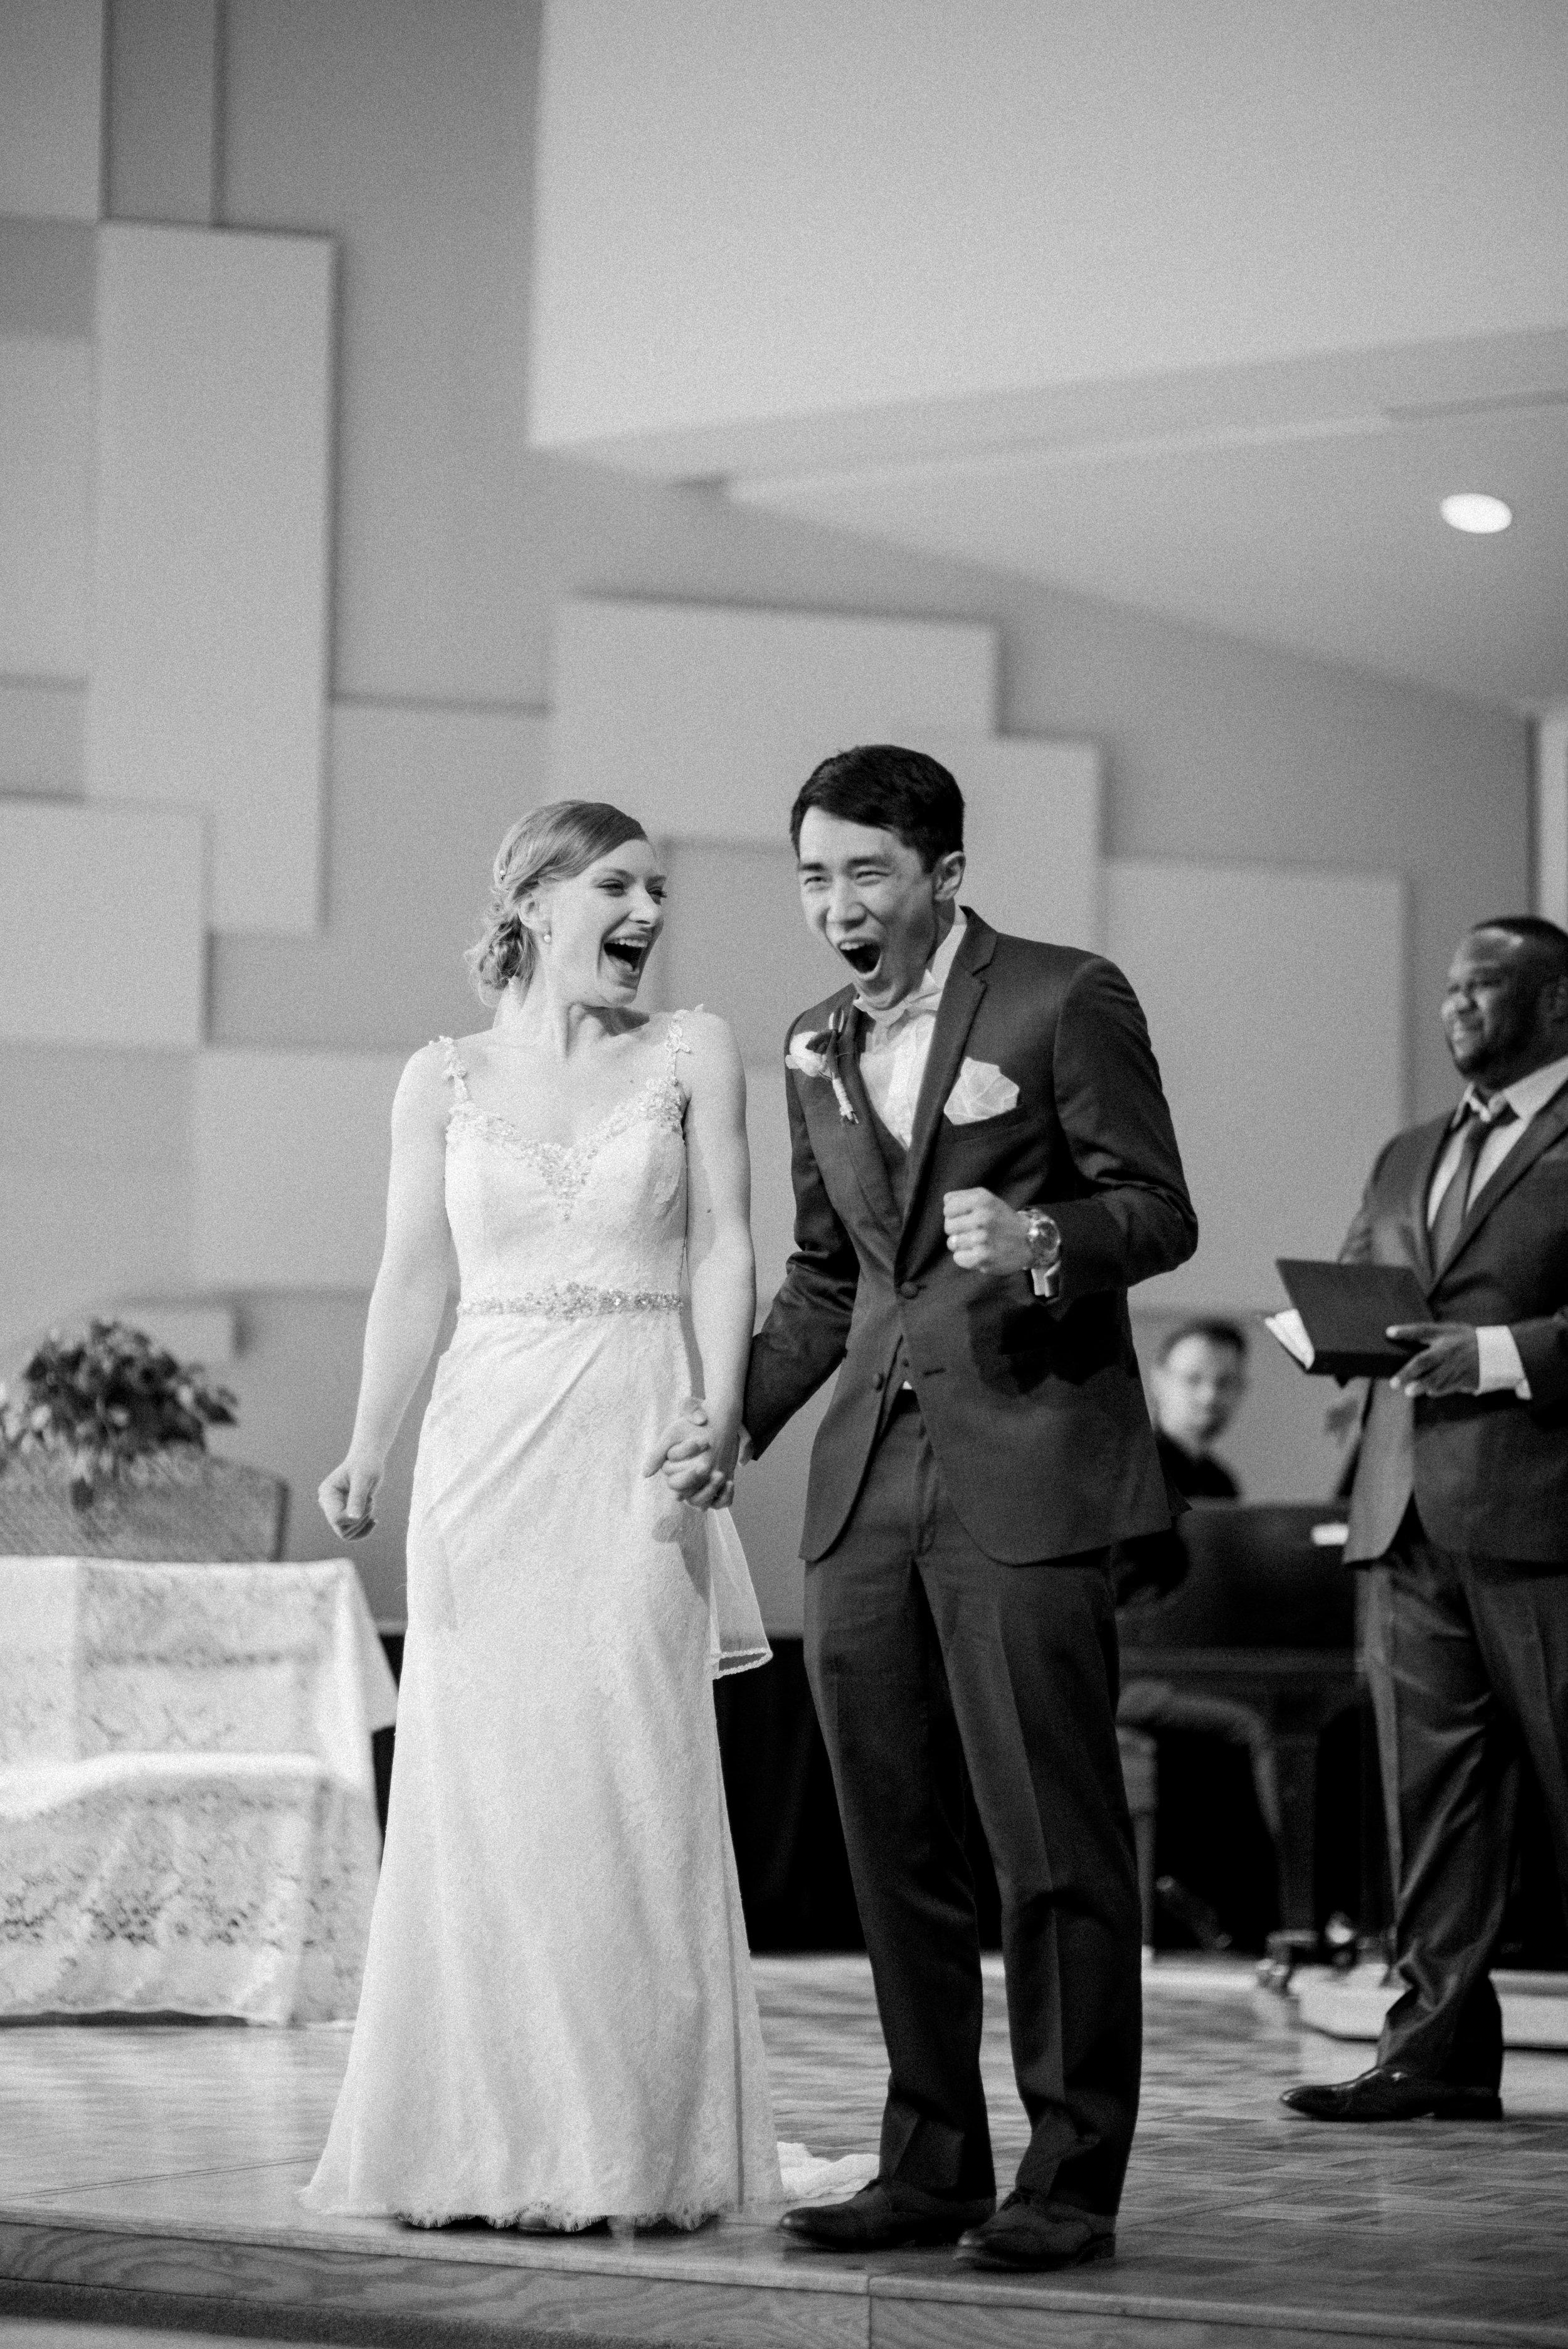 Cincinnati Multicultural Wedding | Cincinnati Wedding Photographer